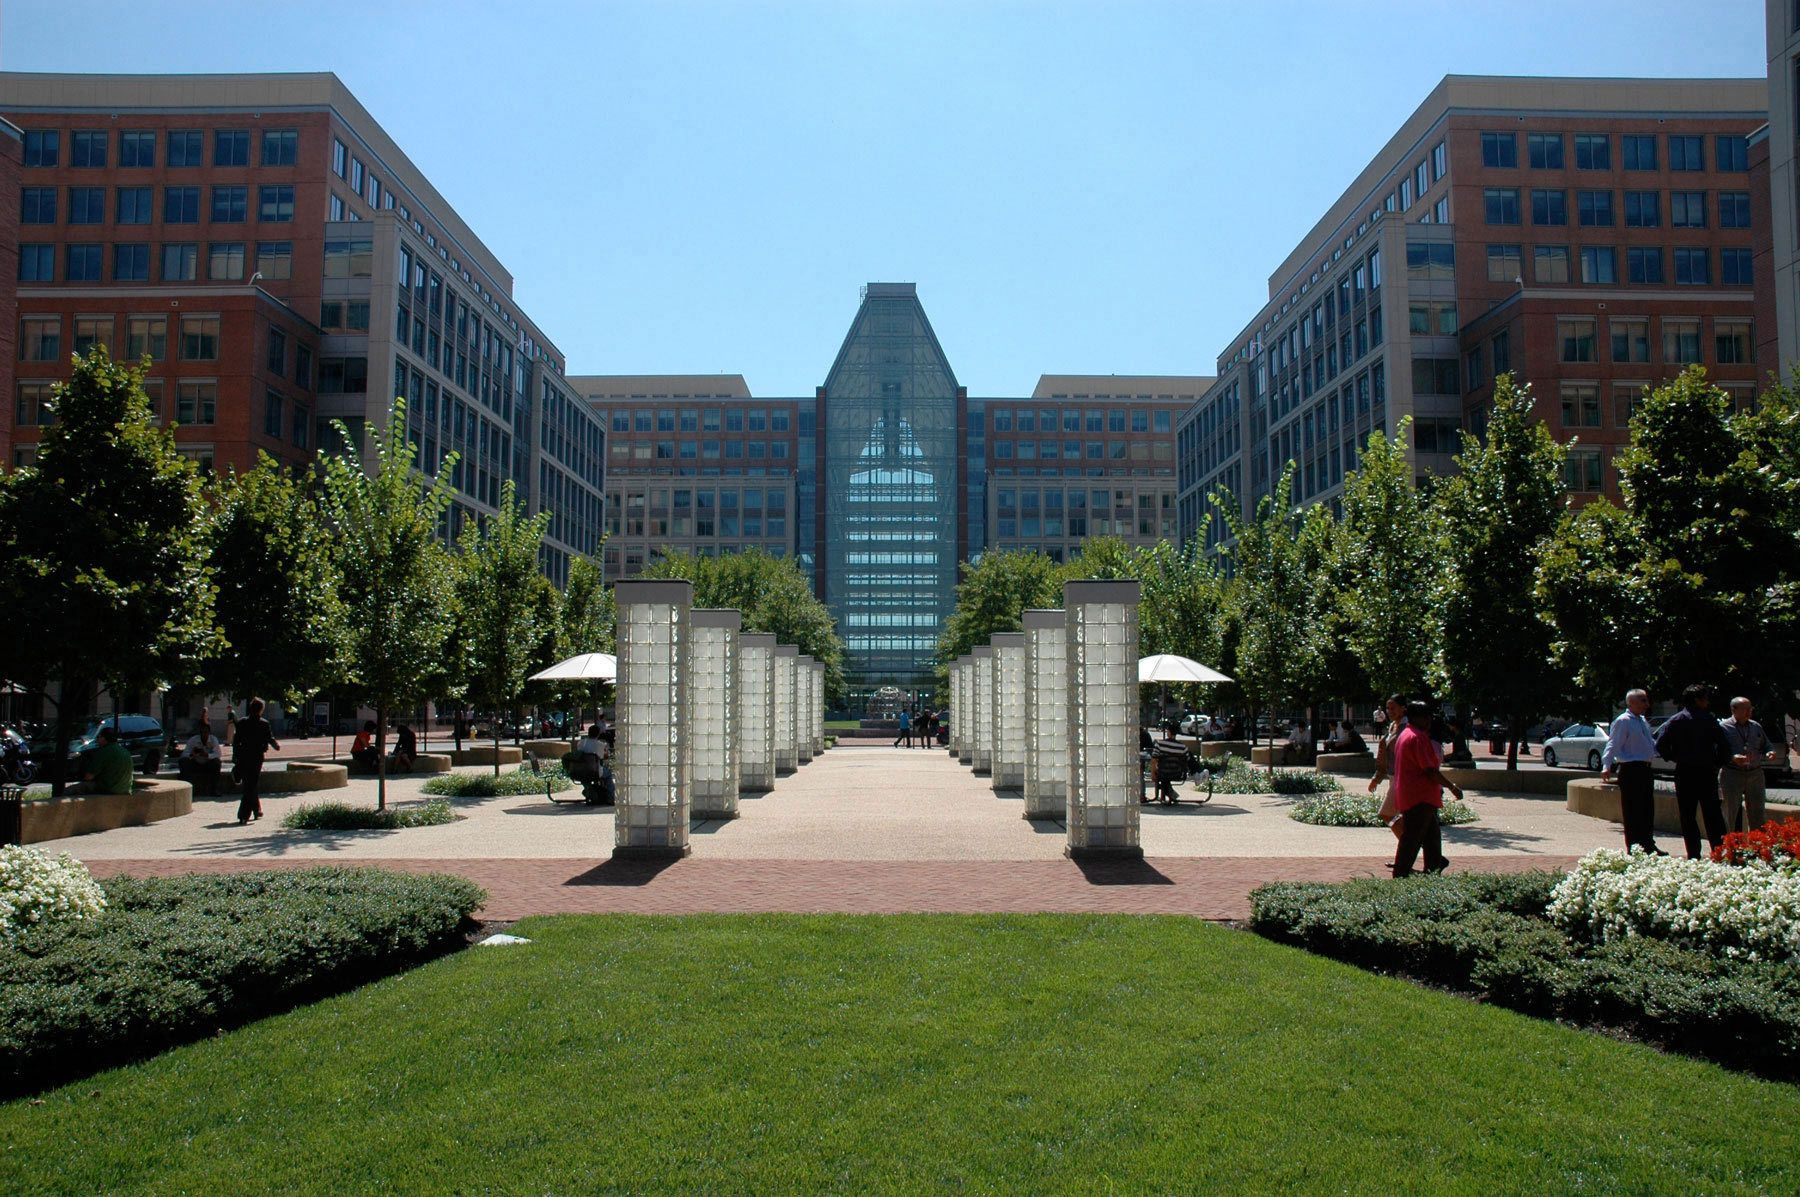 U. S. Patent + Trademark Campus - Carlye Place, Alexandria VA